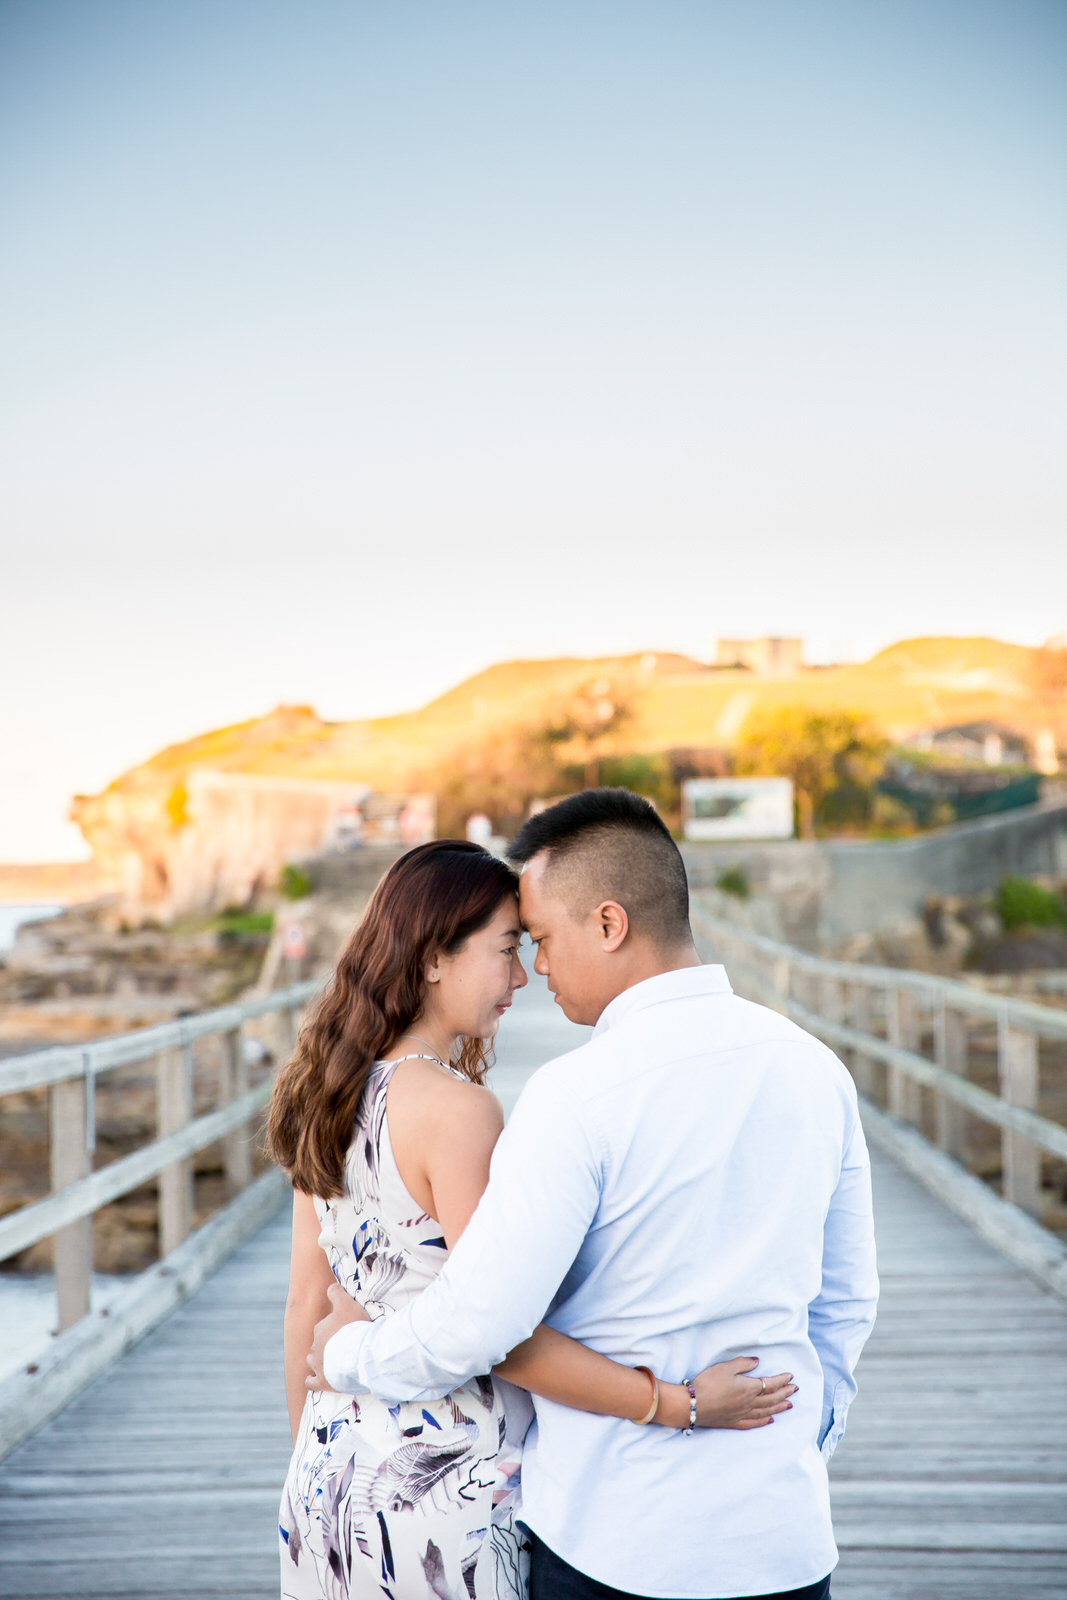 Sydney Engagement Pre-Wedding Photography Session - Jennifer Lam Photography - La Perouse (8).jpg